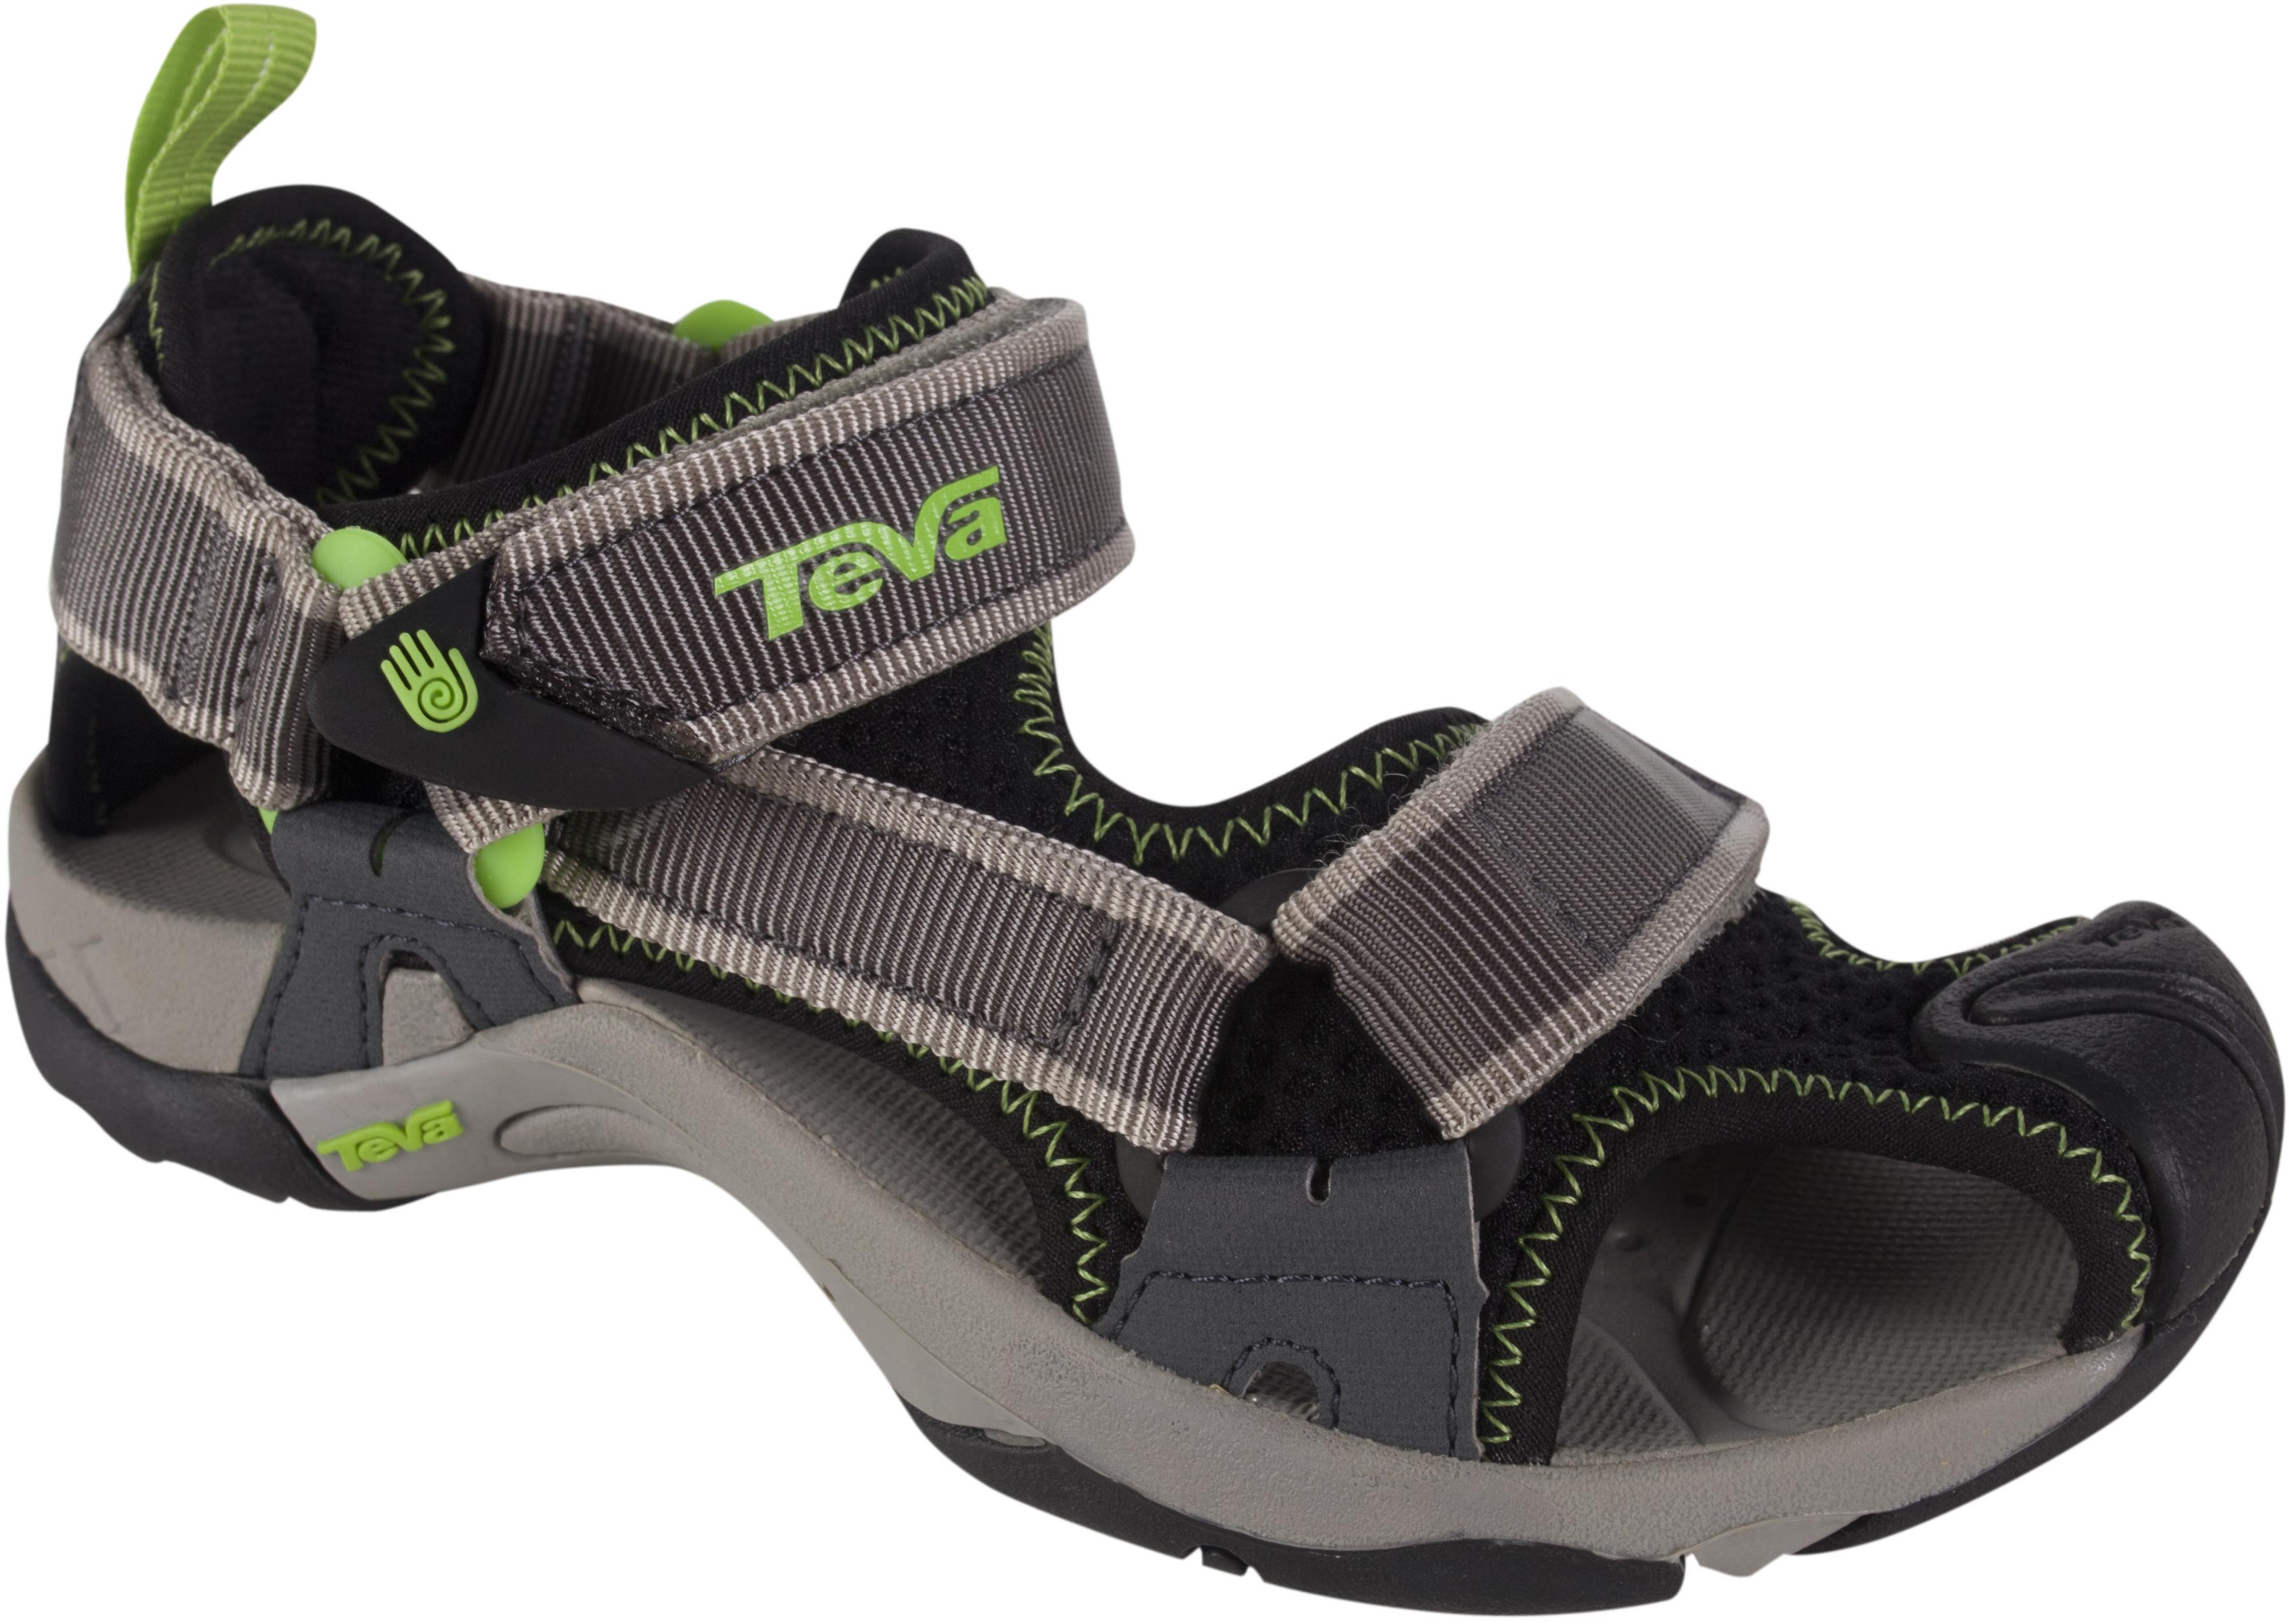 Teva Toachi Kids Sandals - Children to